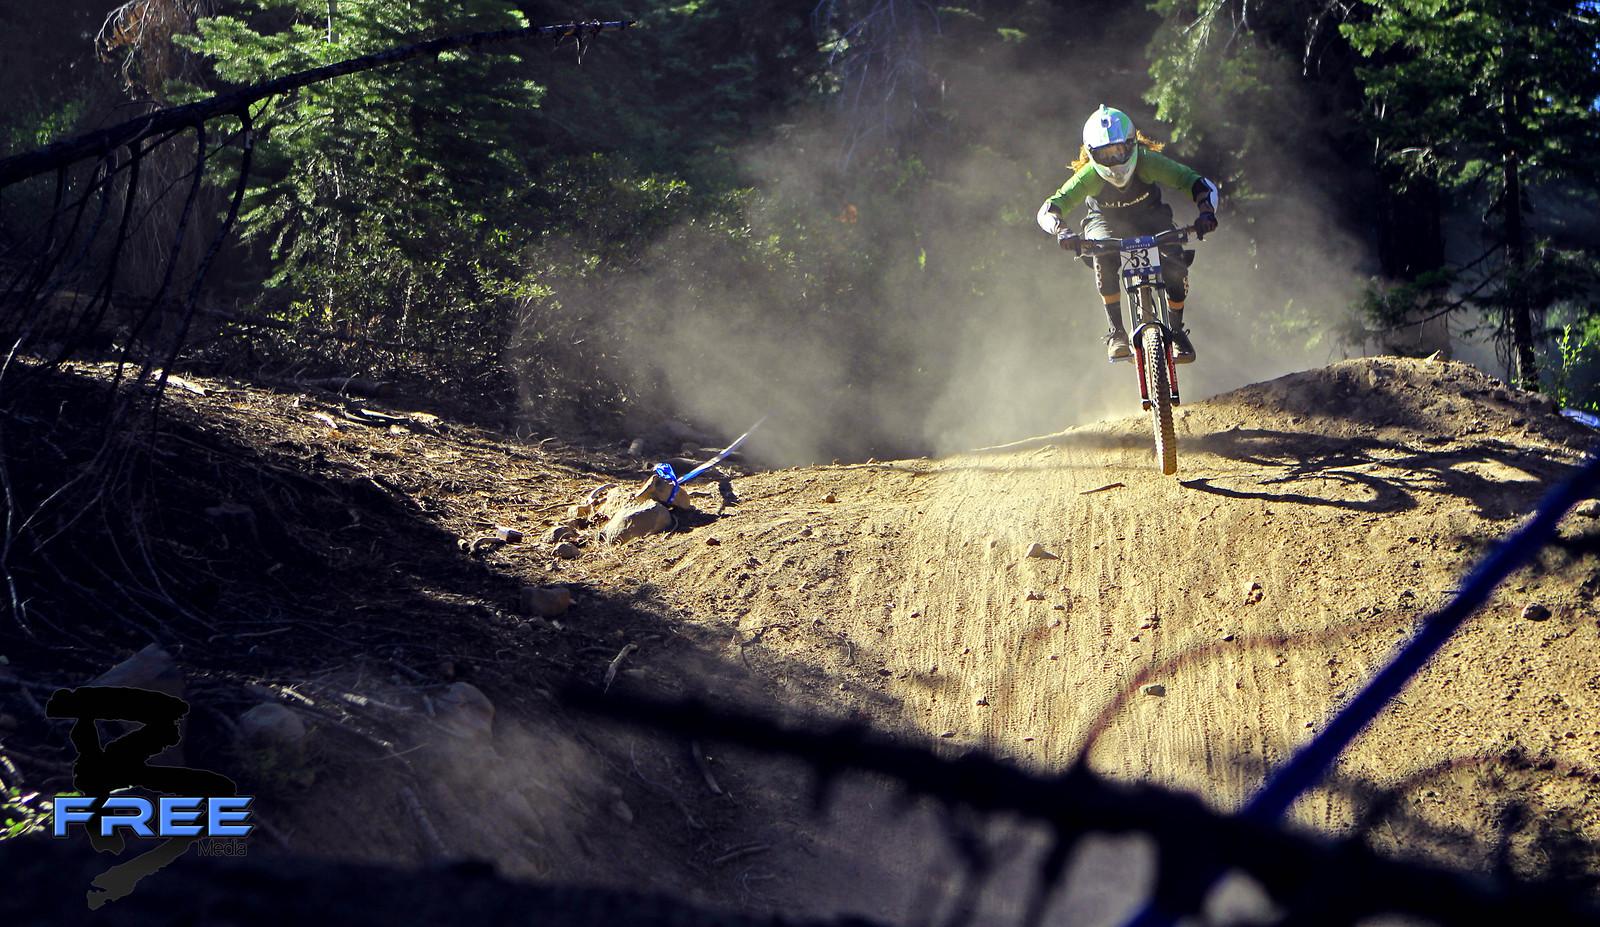 done6 1 - GnarHuck - Mountain Biking Pictures - Vital MTB